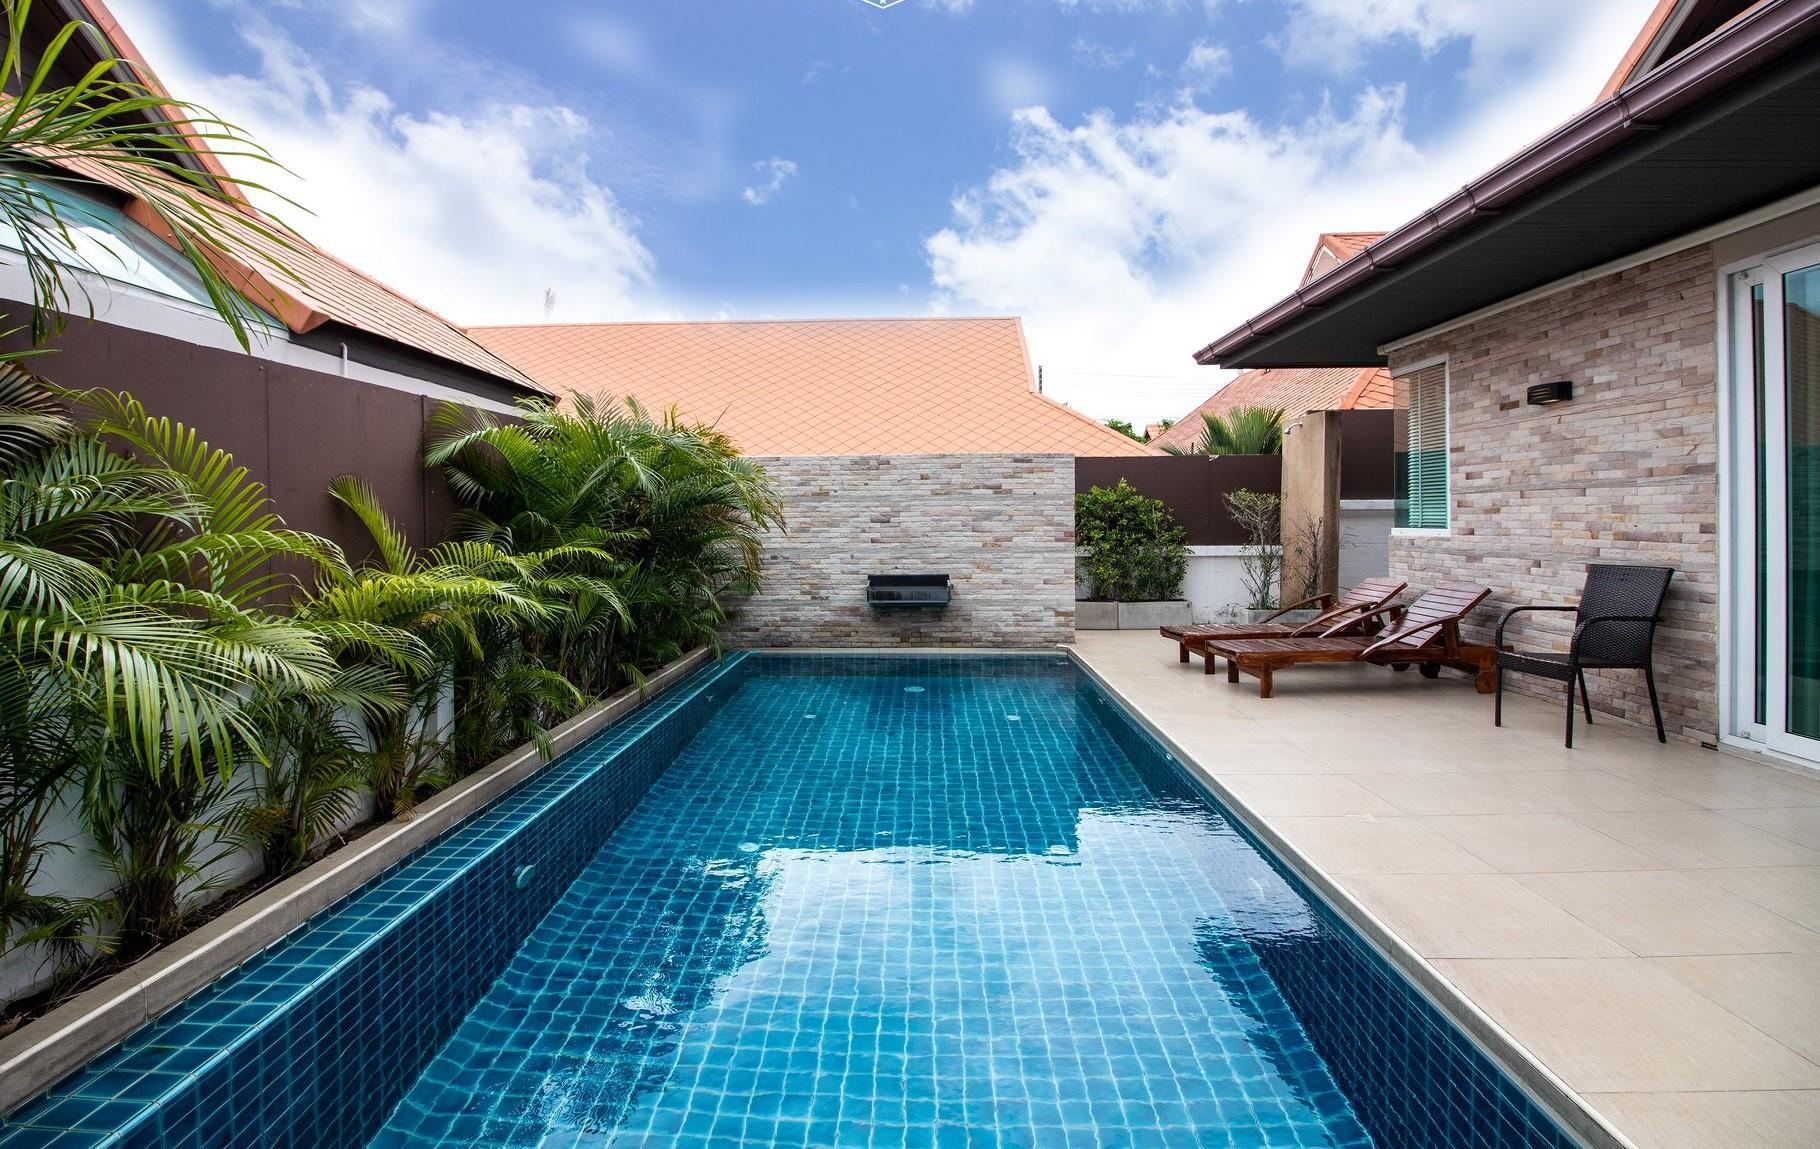 The Ville Pool Villa  3  Bedroom วิลลา 3 ห้องนอน 3 ห้องน้ำส่วนตัว ขนาด 235 ตร.ม. – เขาตาโล